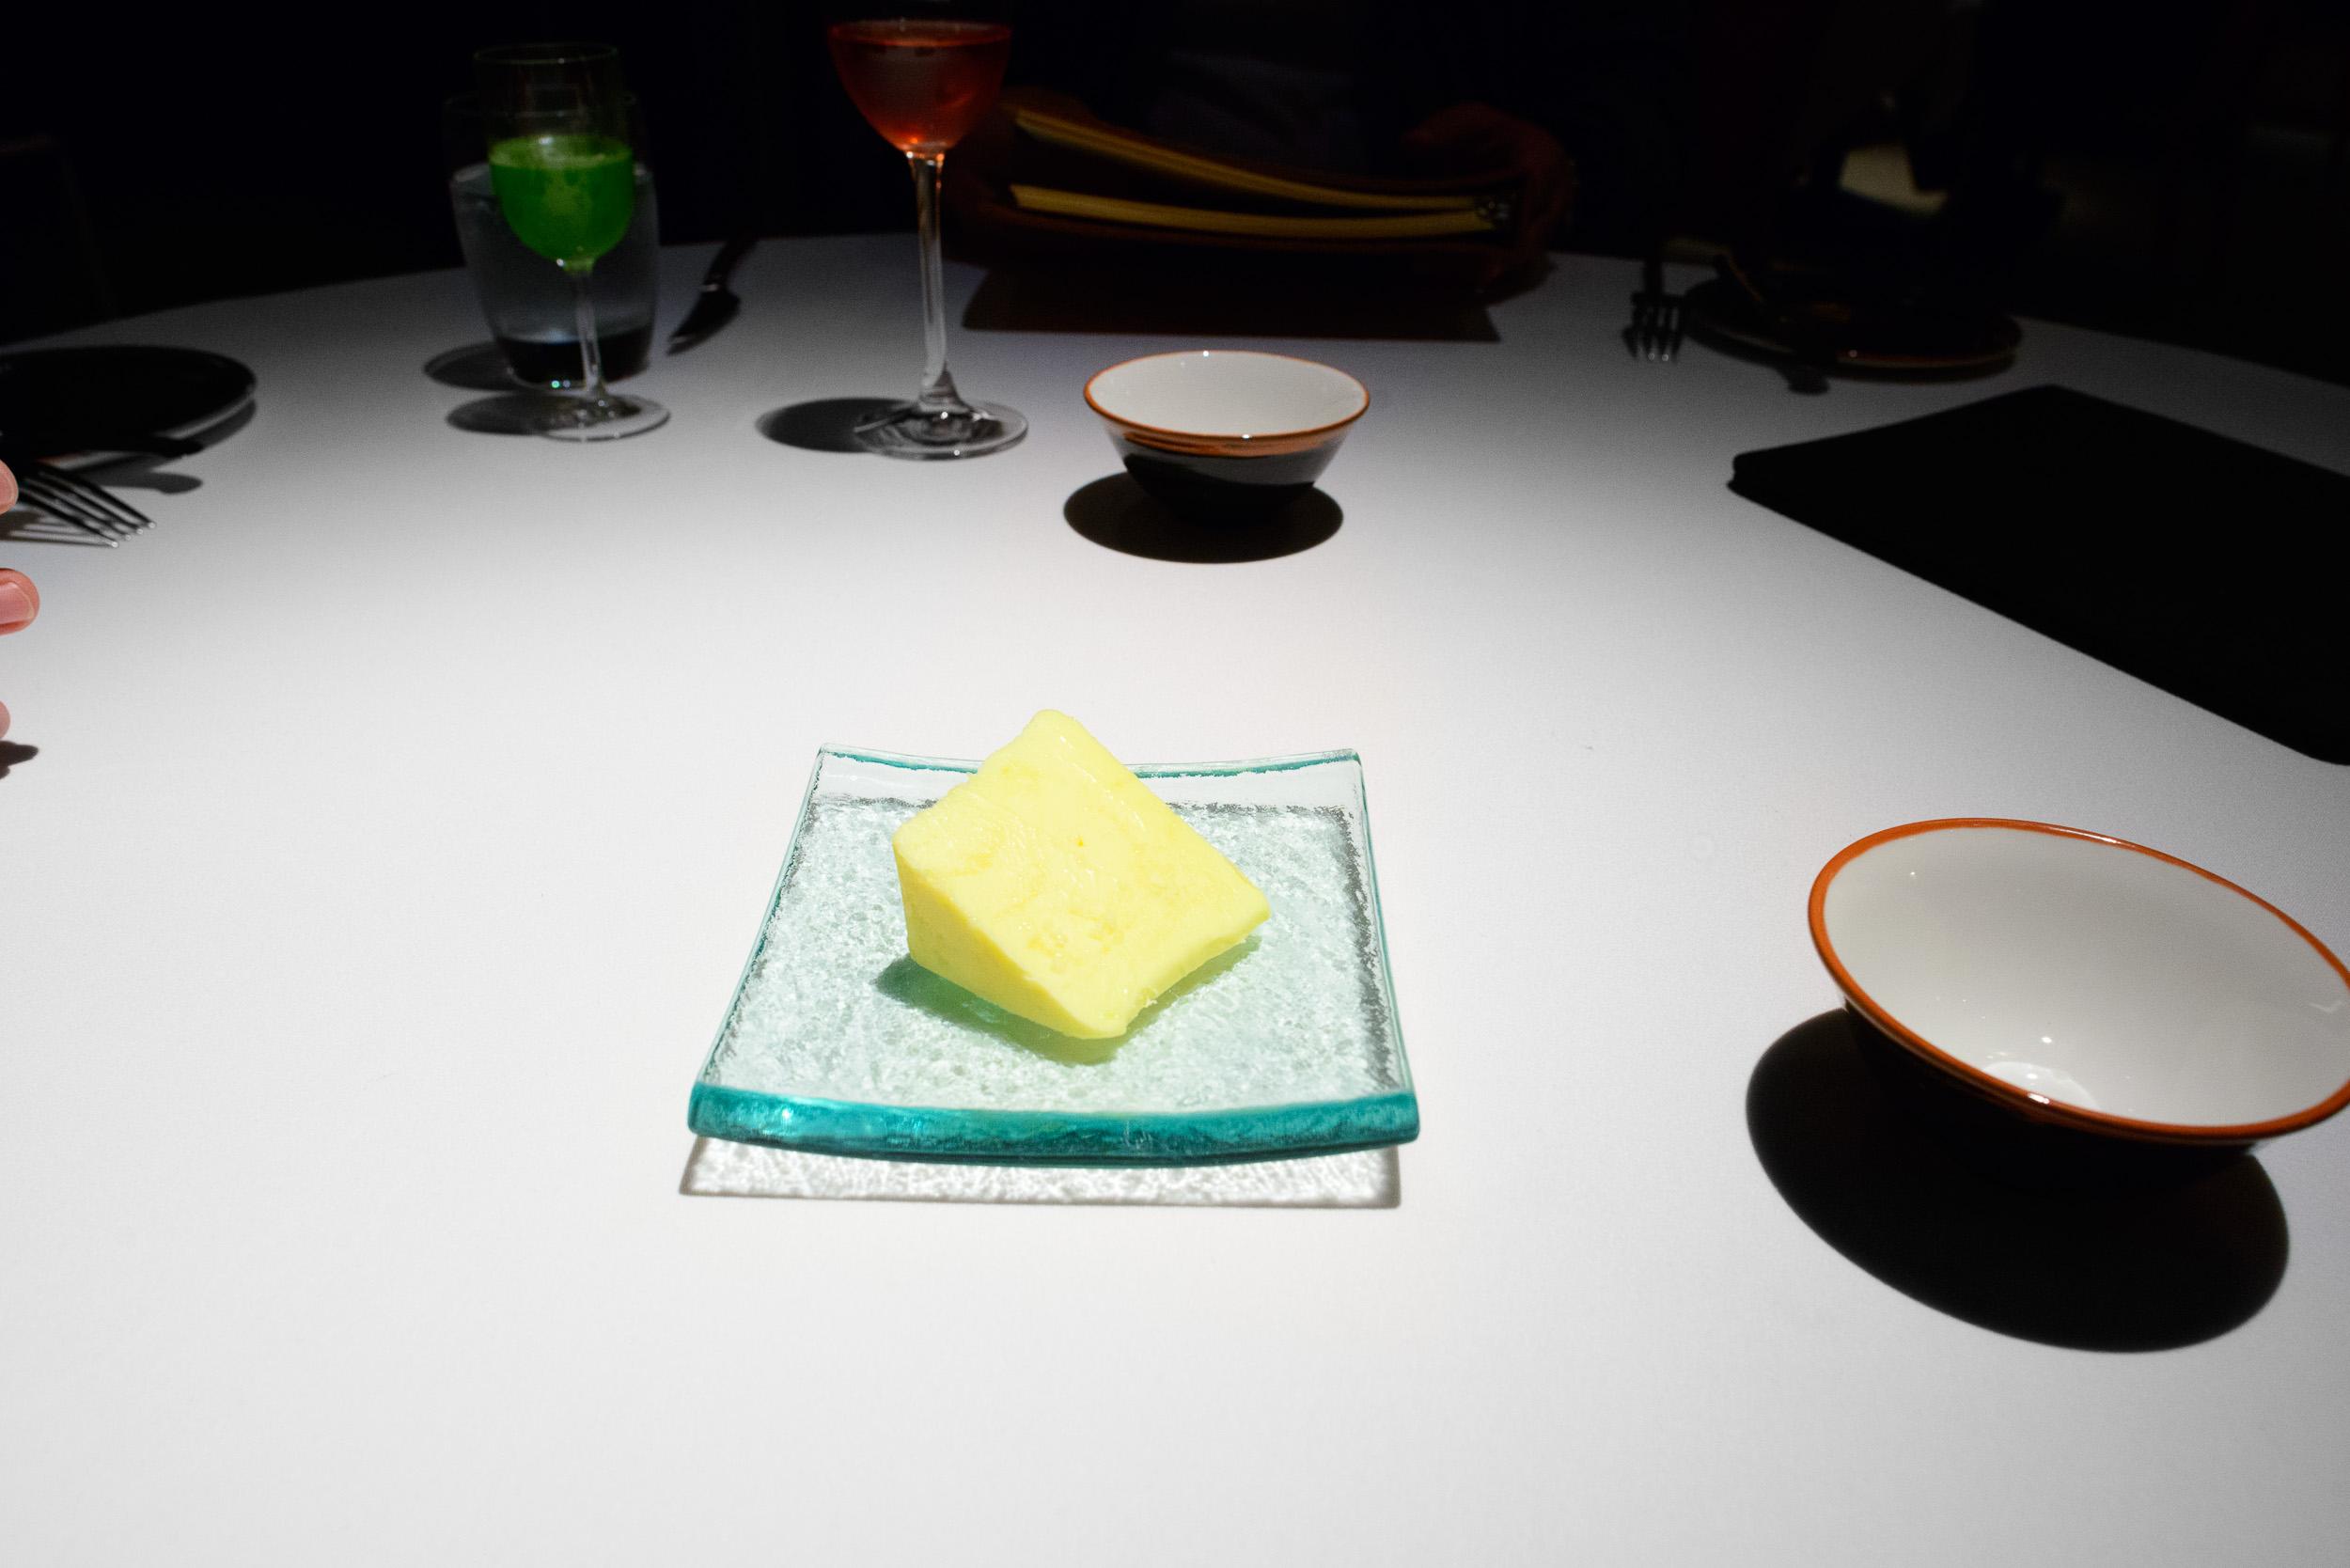 House-made butter